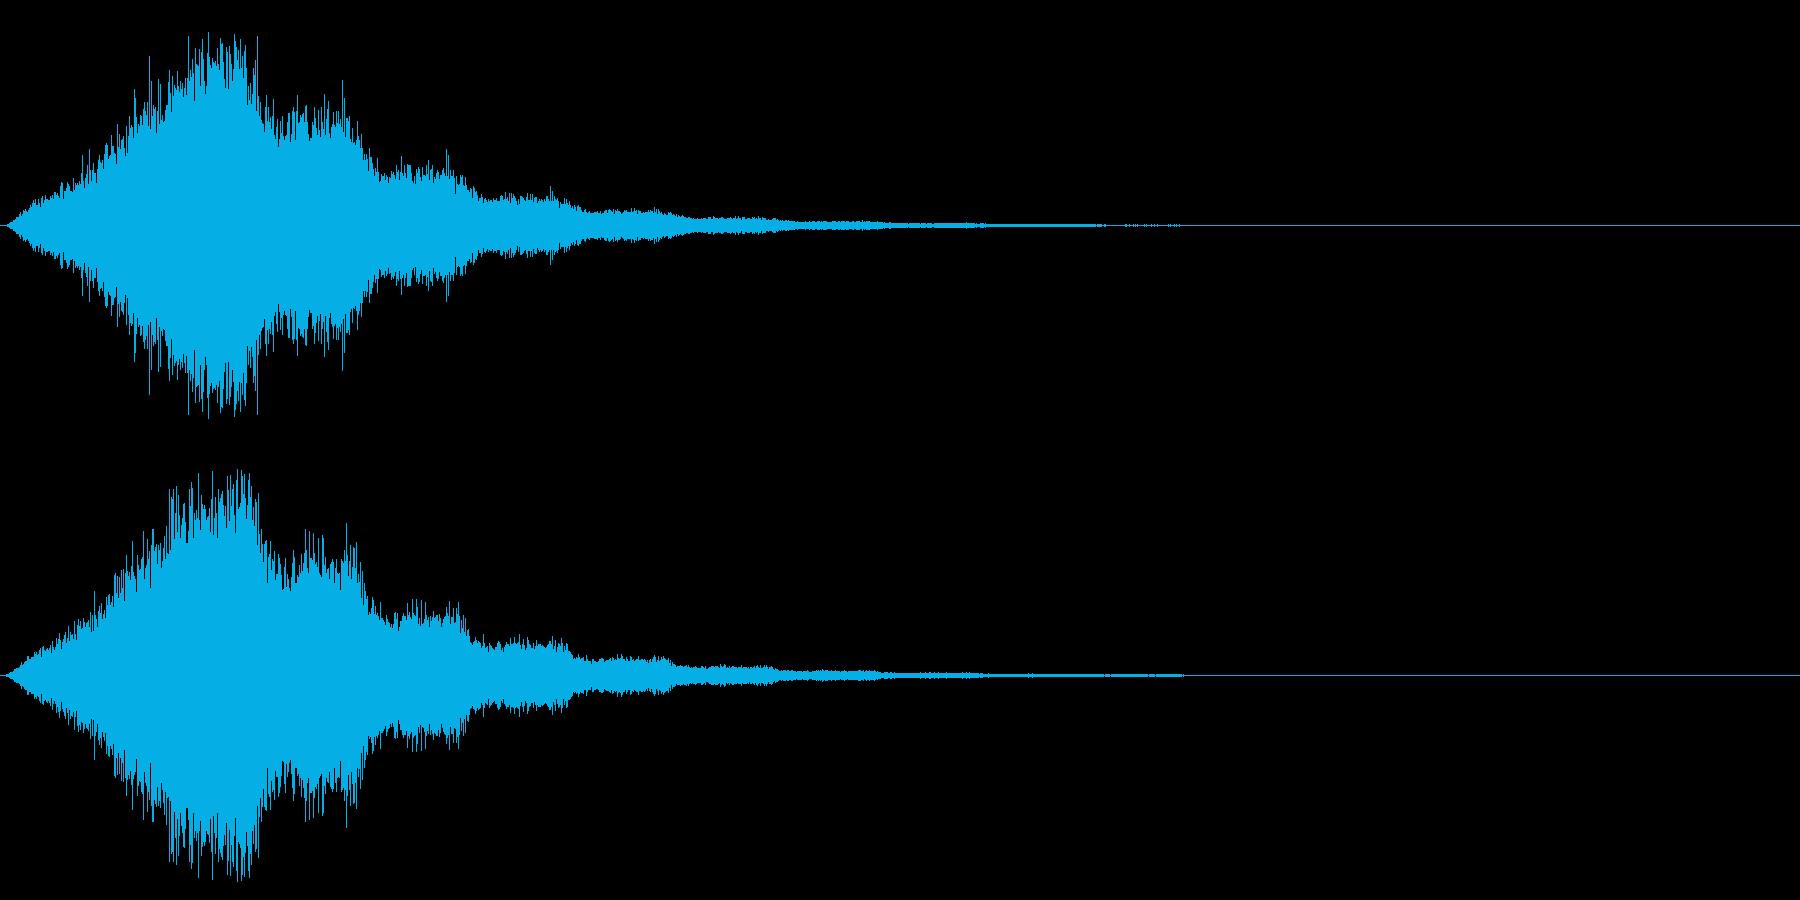 Dark_Reverse-04delayの再生済みの波形